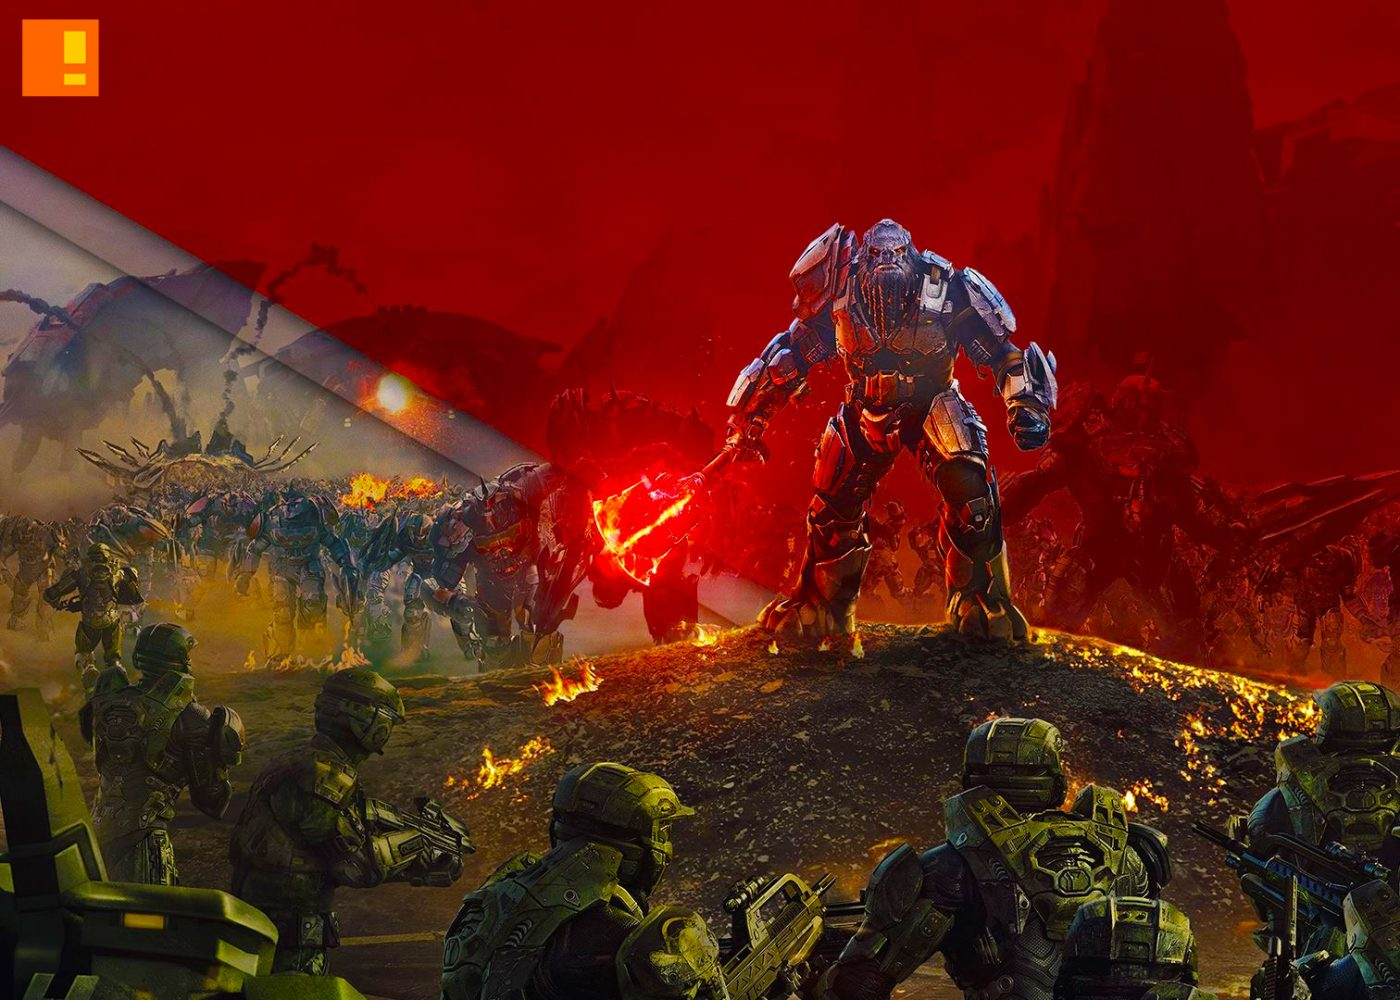 Halo wars 2 2018 - Дата выхода, обзор игры